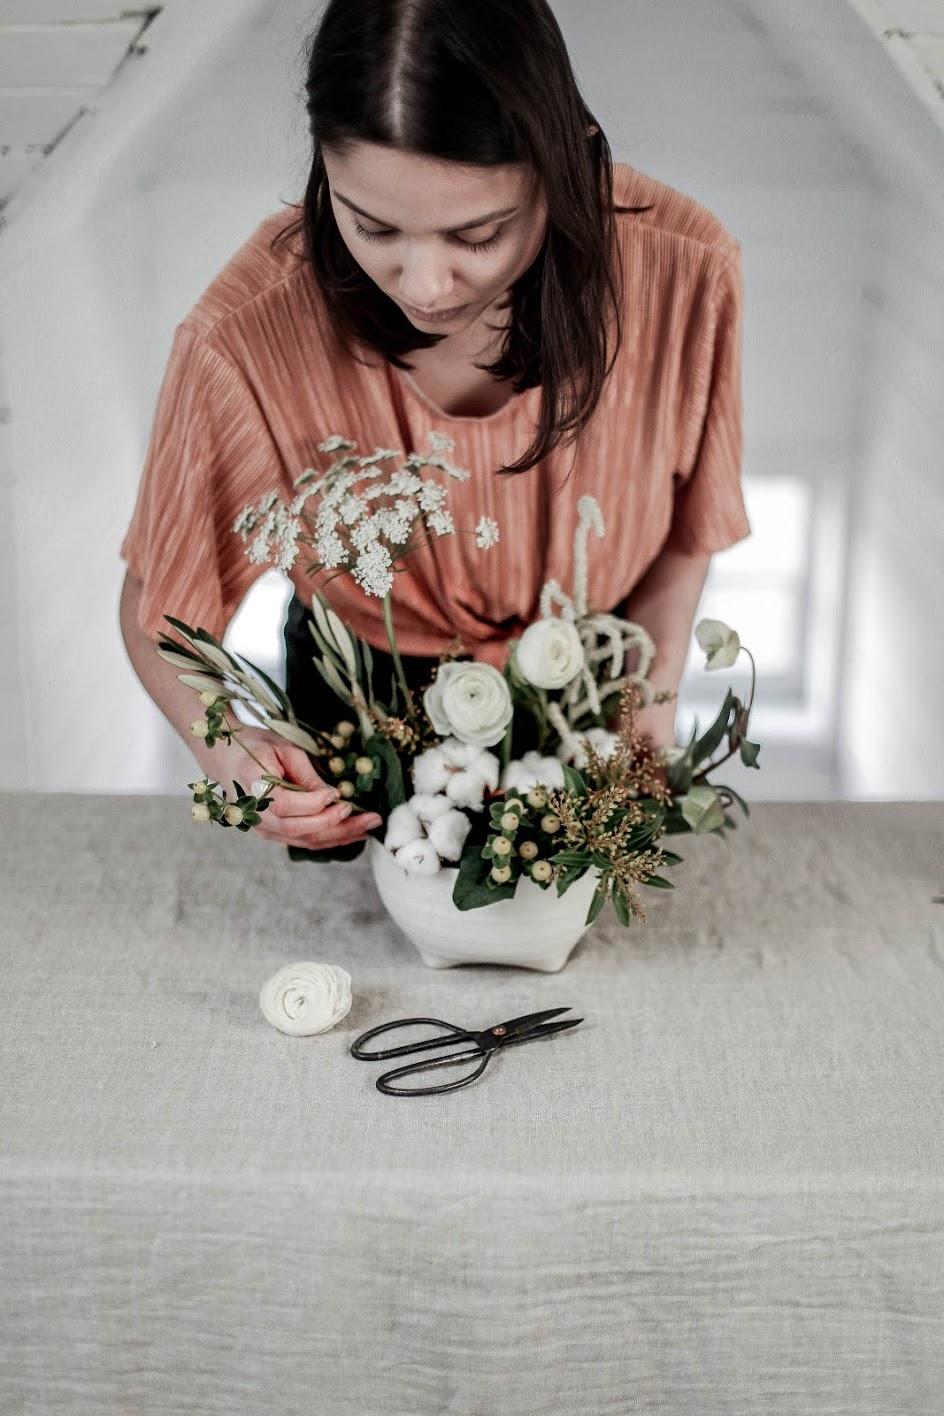 arrange-your-own-holiday-florals.jpg